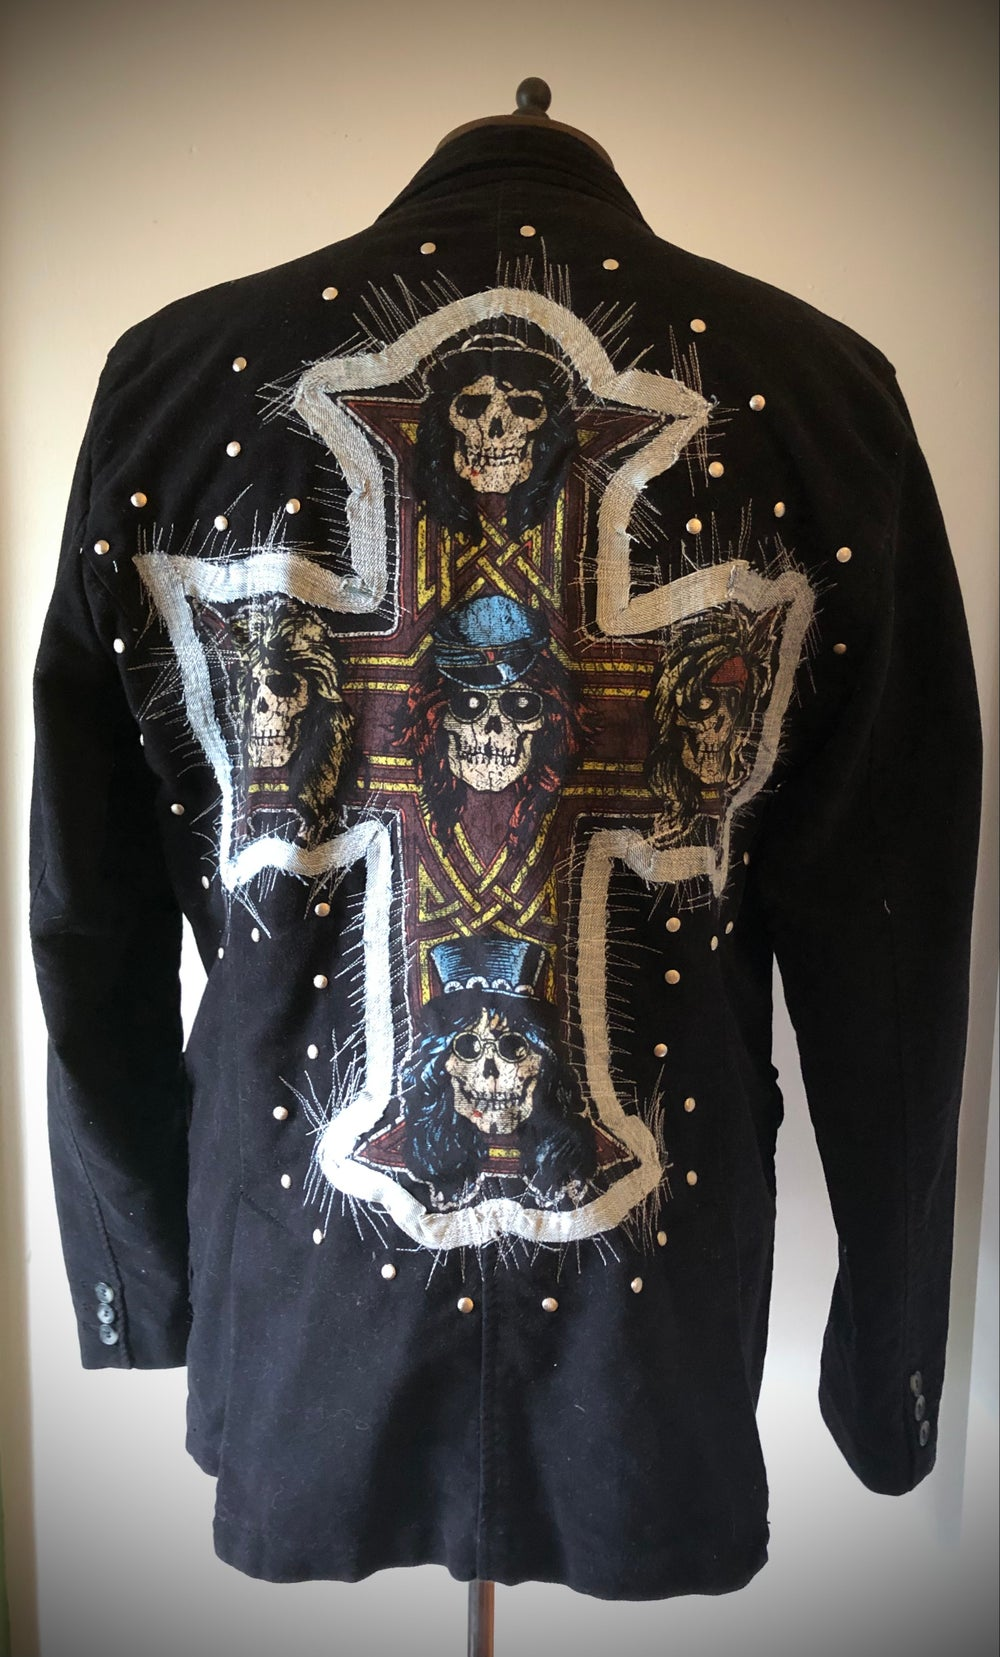 Guns N' Roses upcycled suit jacket